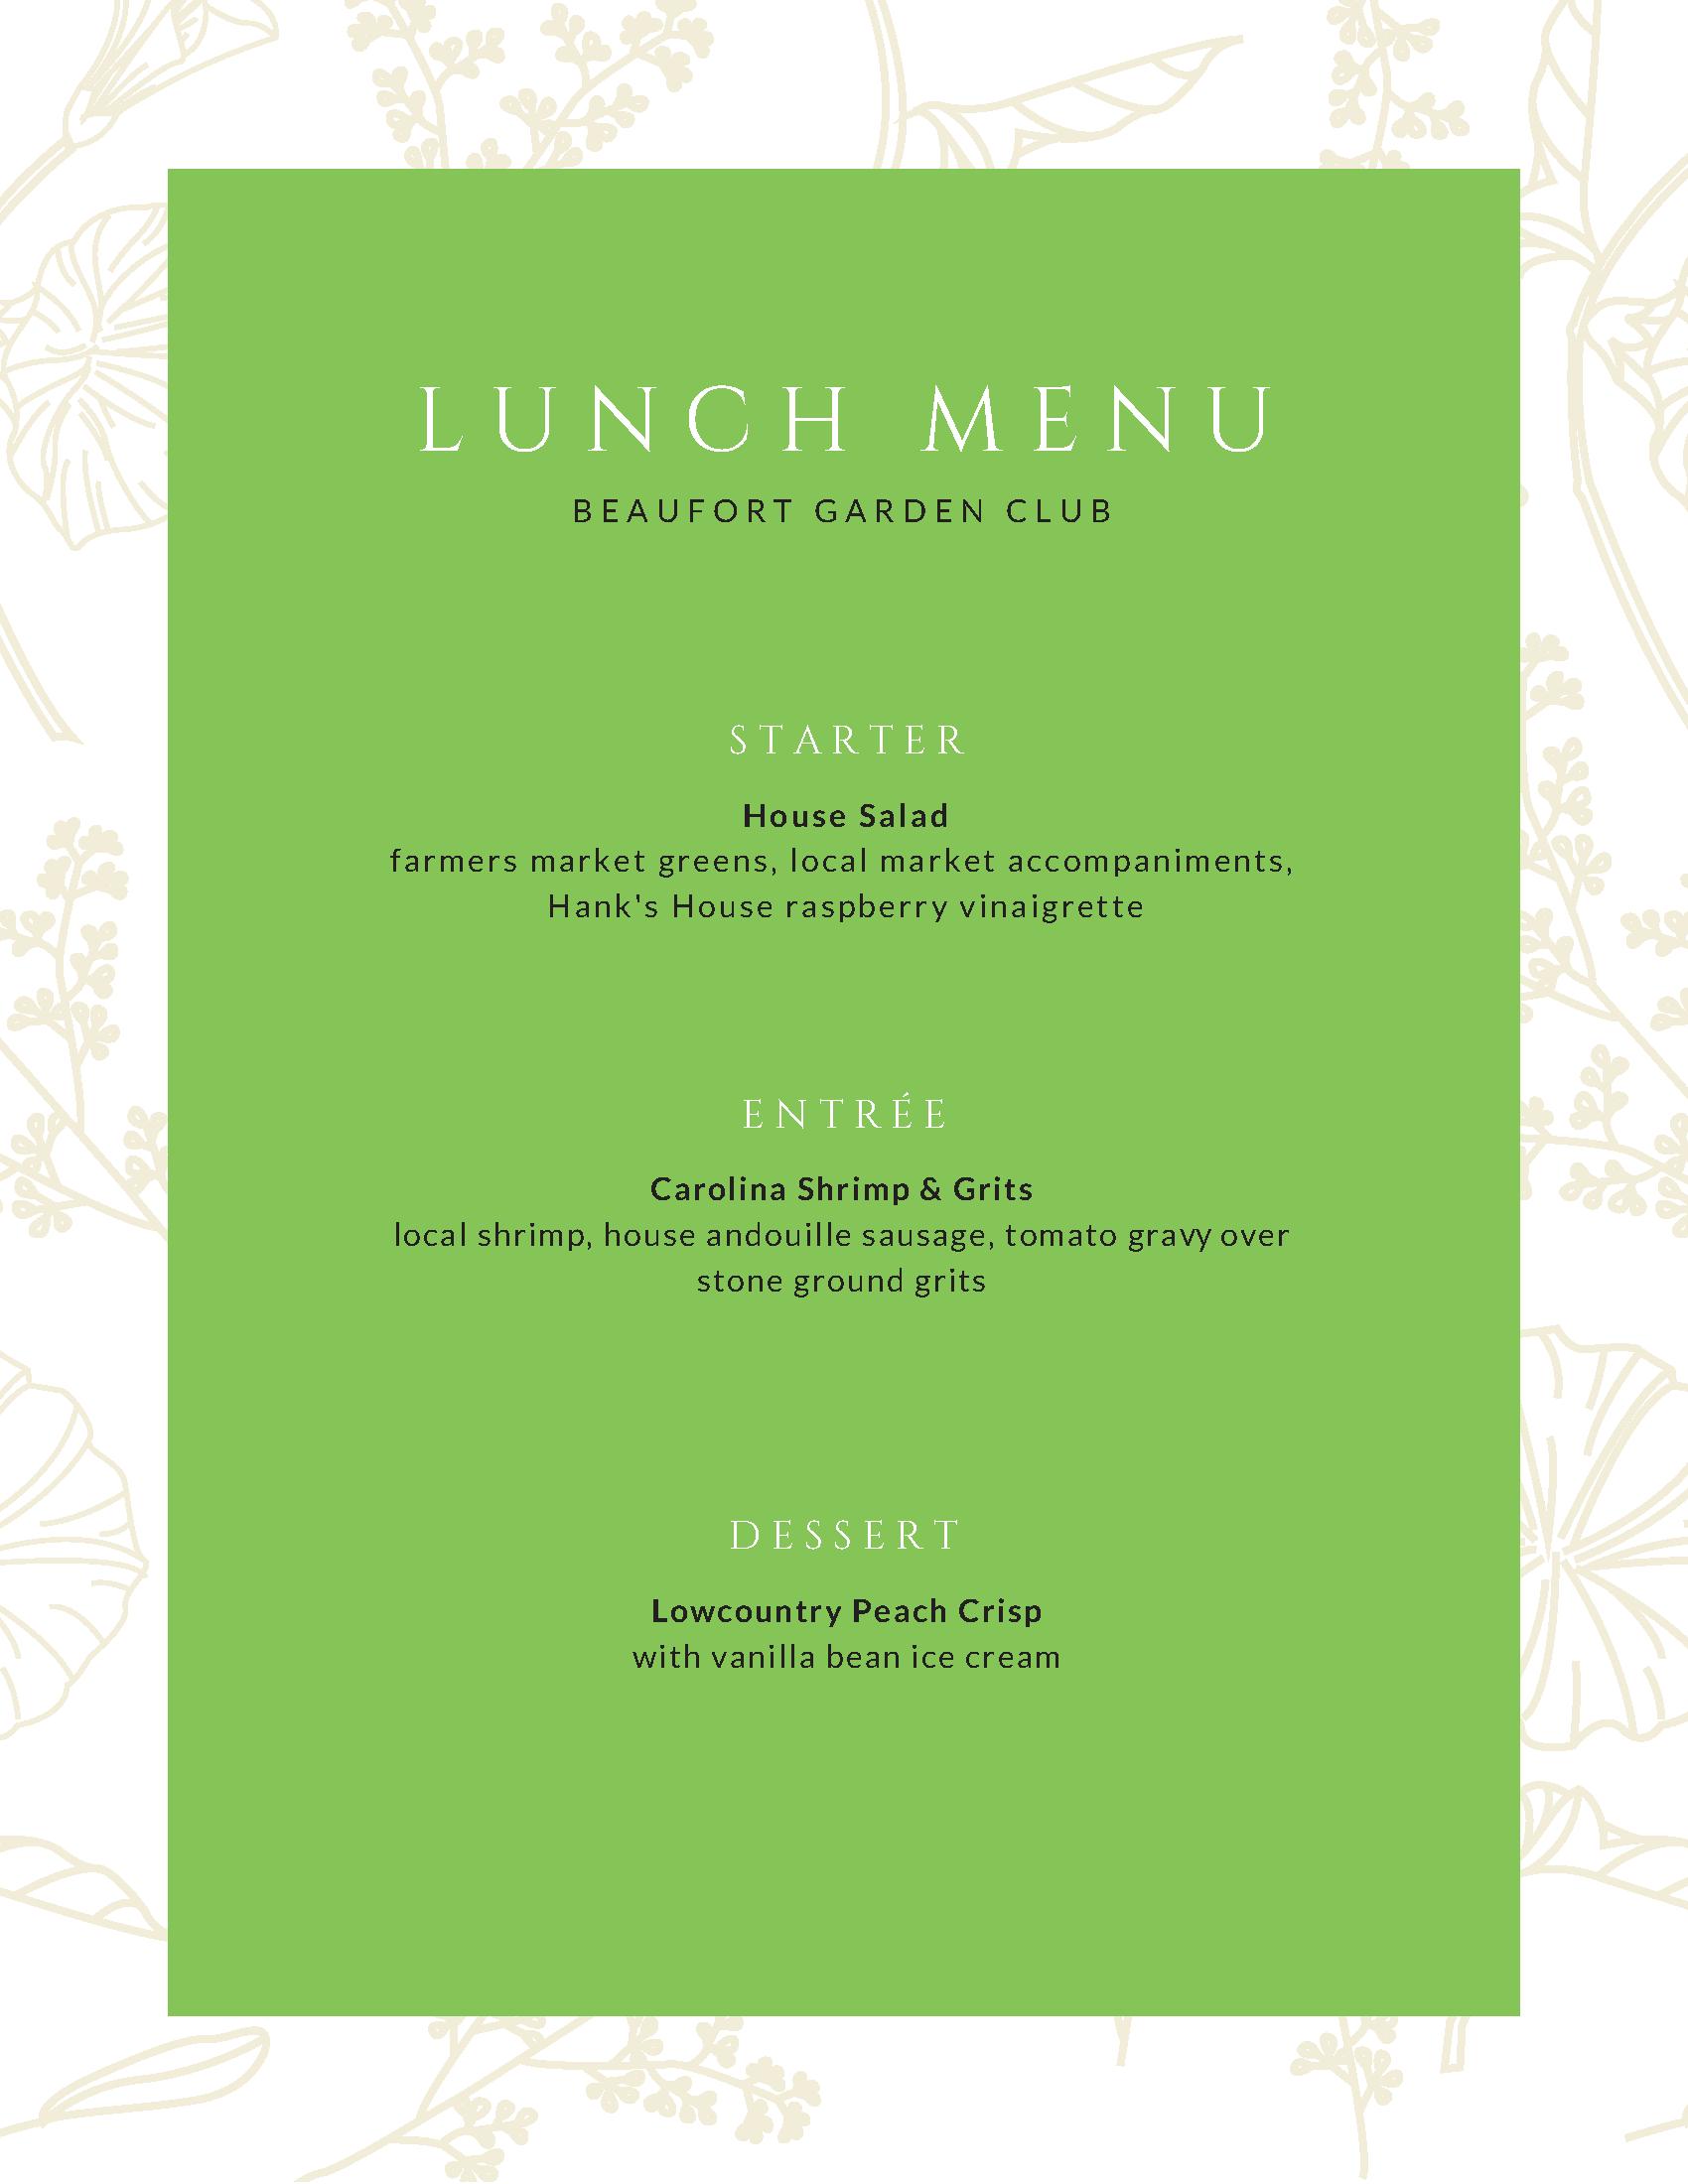 Beaufort Garden Club Lunch Menu